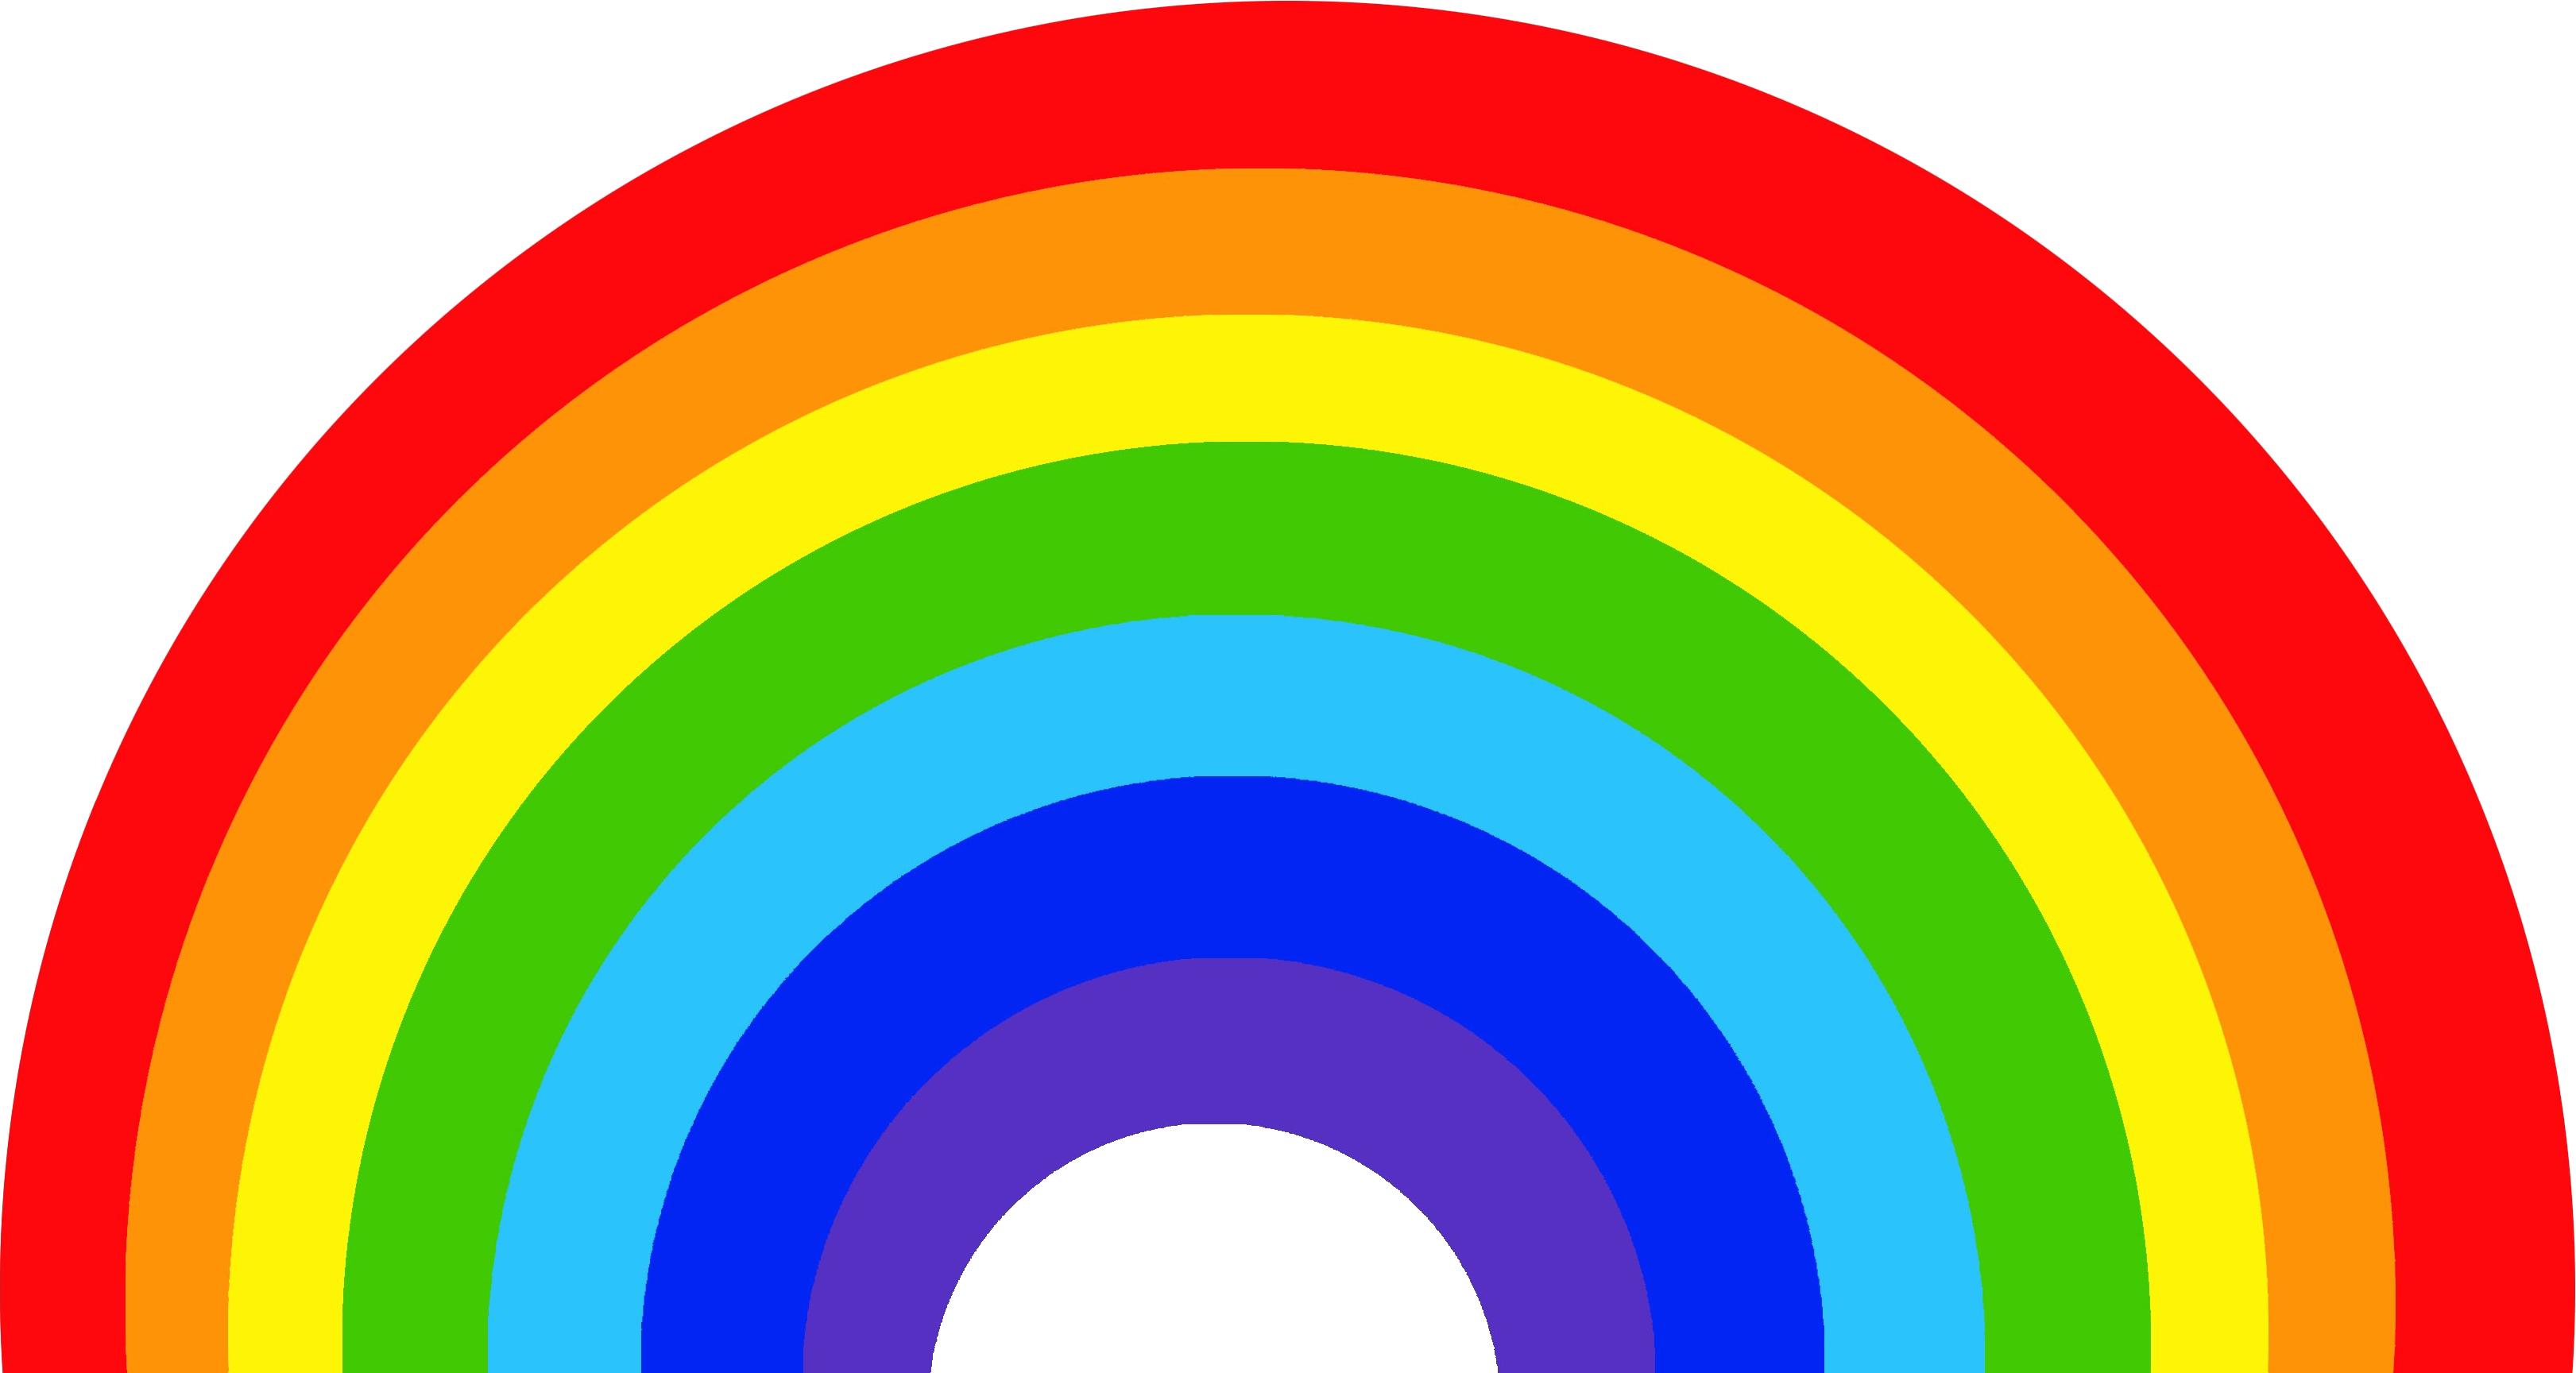 Rainbow PNG Image - PurePNG | Free transparent CC0 PNG ...